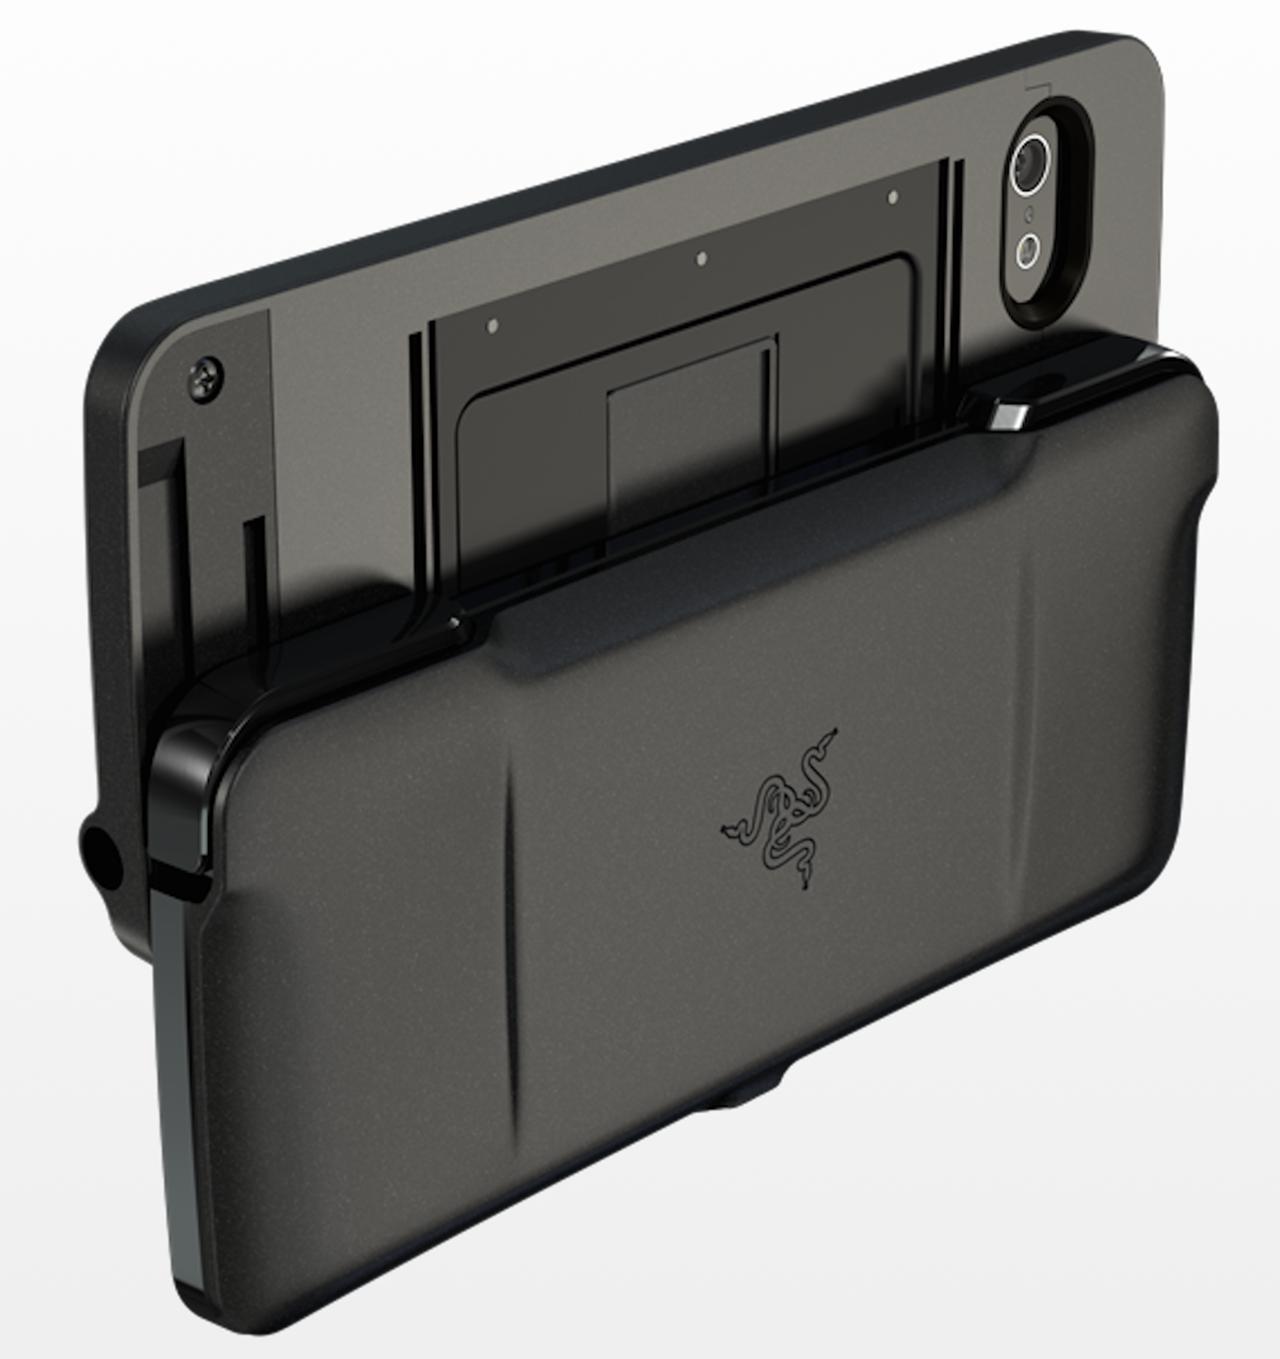 Razer Junglecat iPhone gamepad released with custom profiles